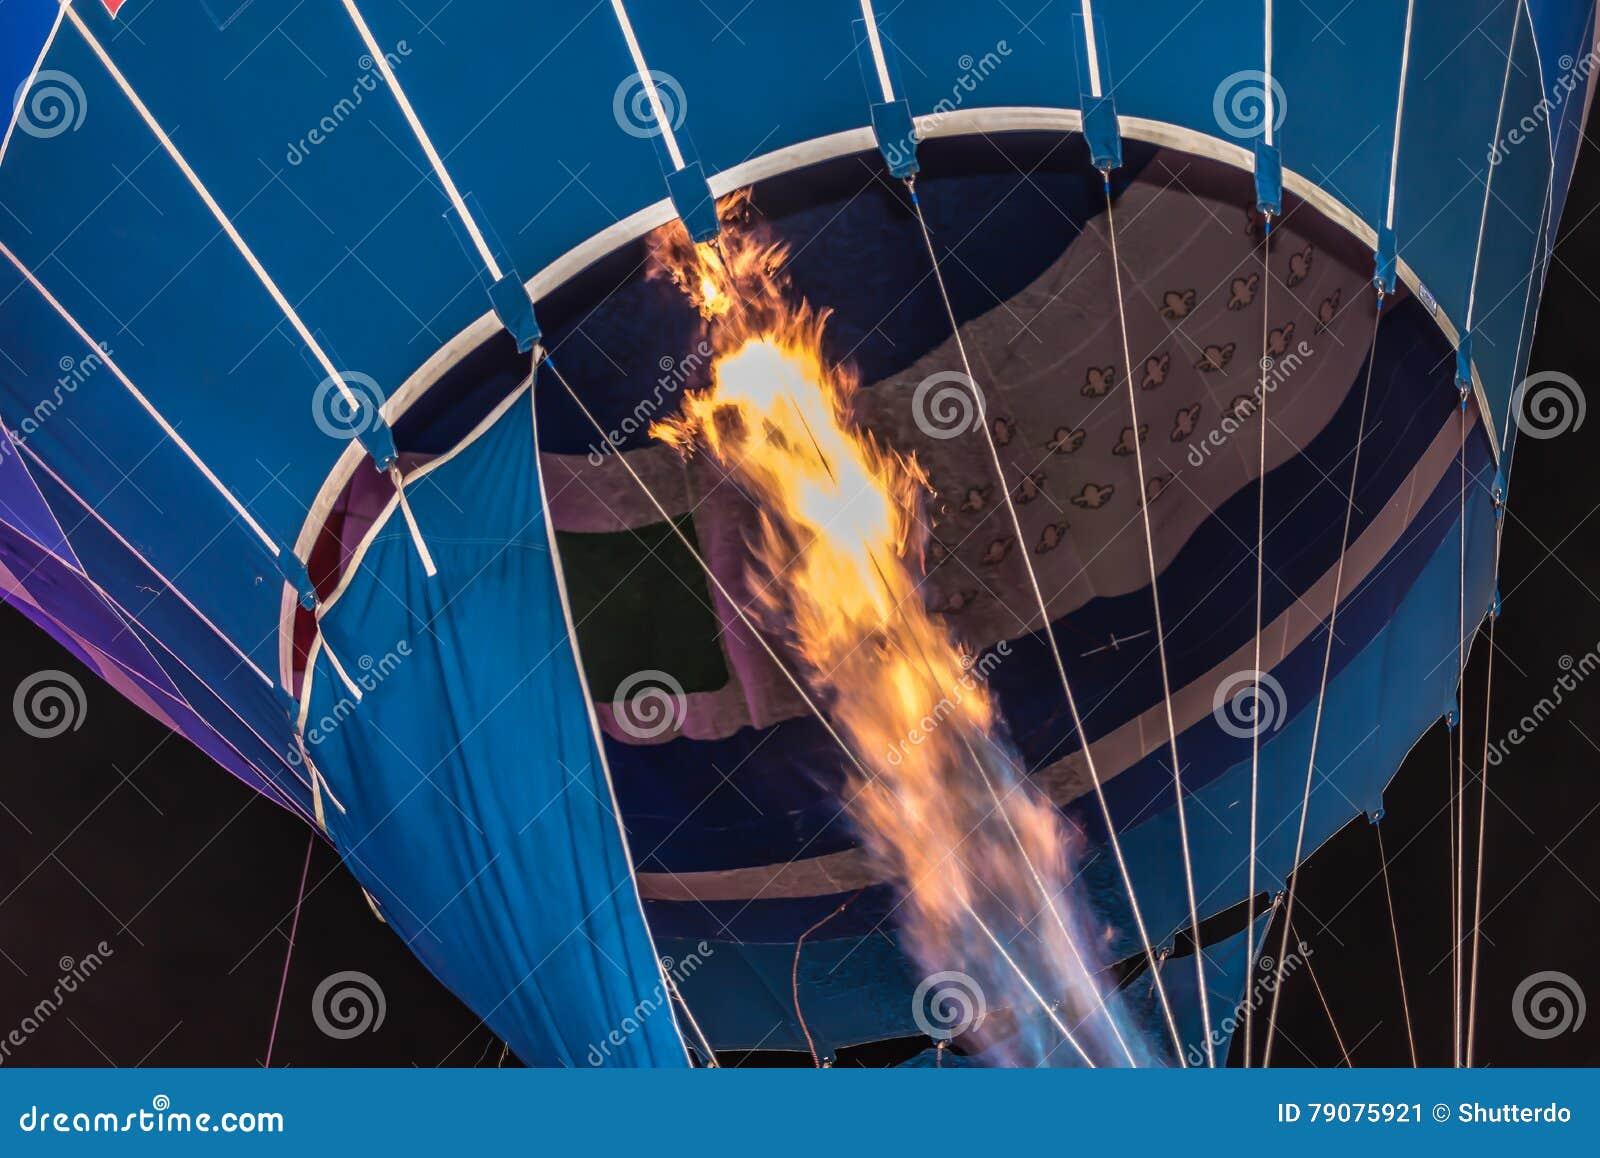 Flames Filling a Hot Air Balloon